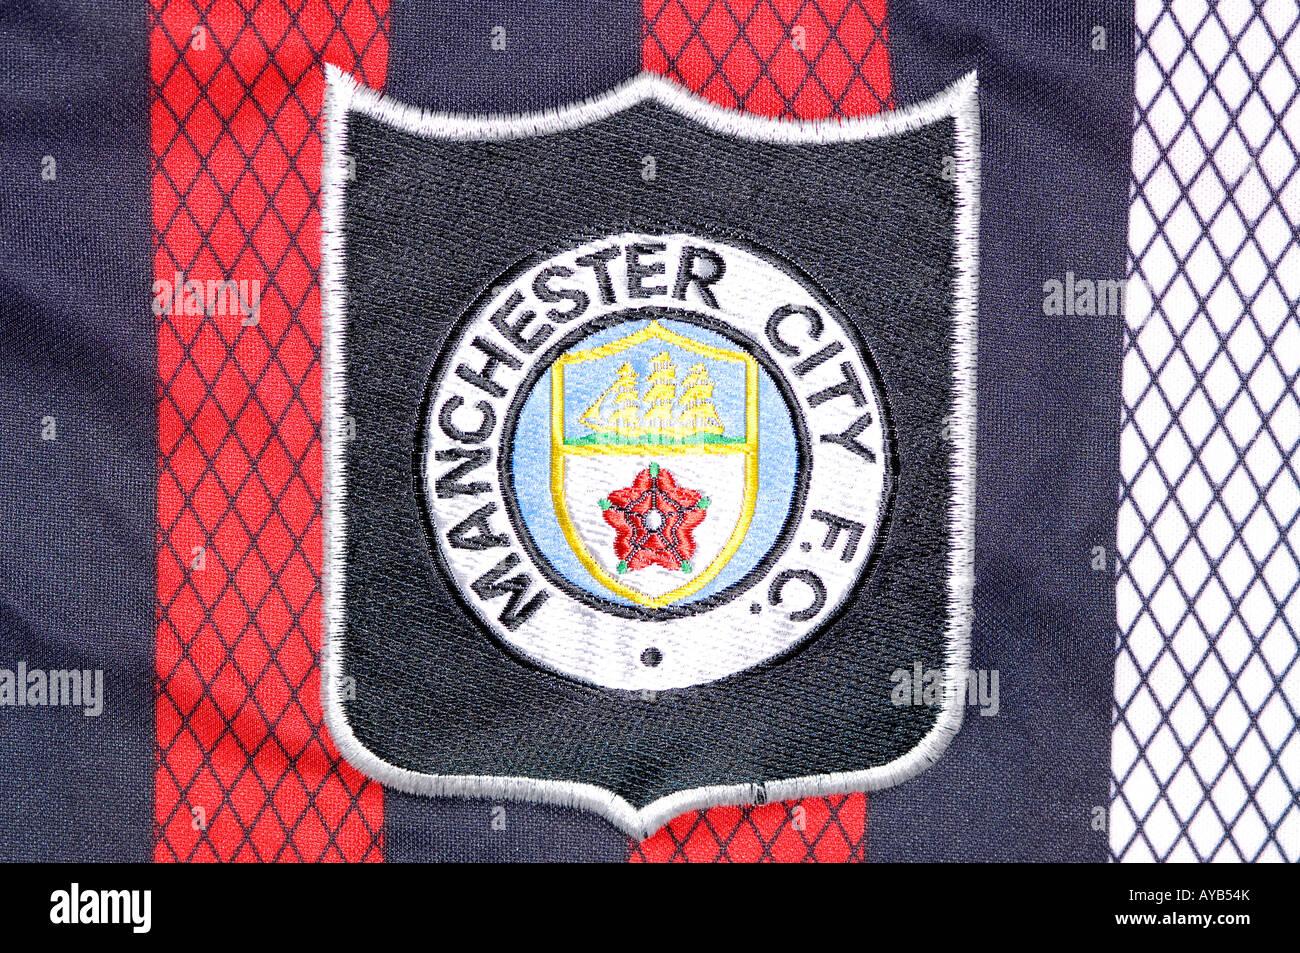 manchester city football club premier league team badge